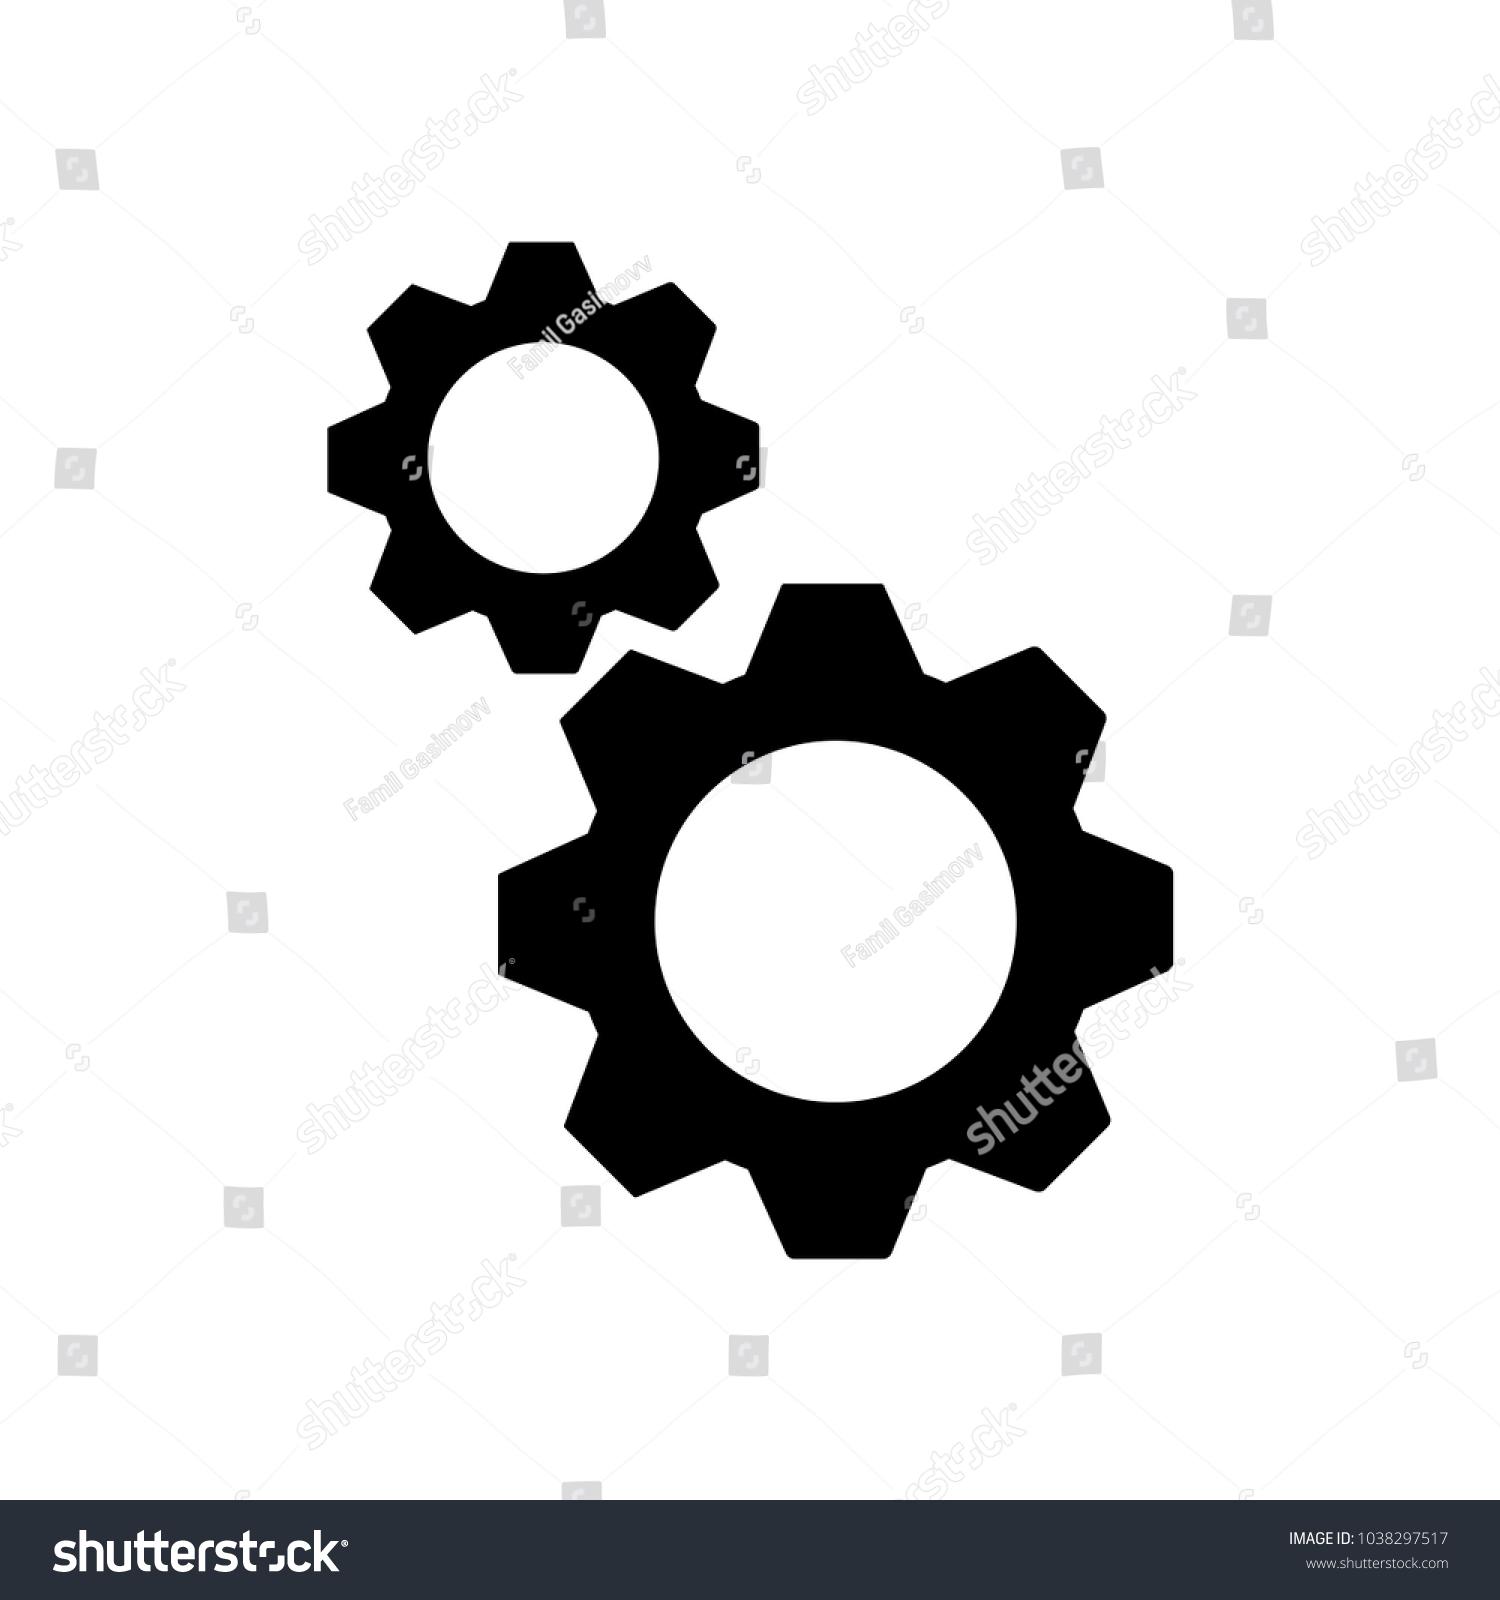 Gearcog Icon Coghwheelseo Vector Engineengineering Symbol Stock